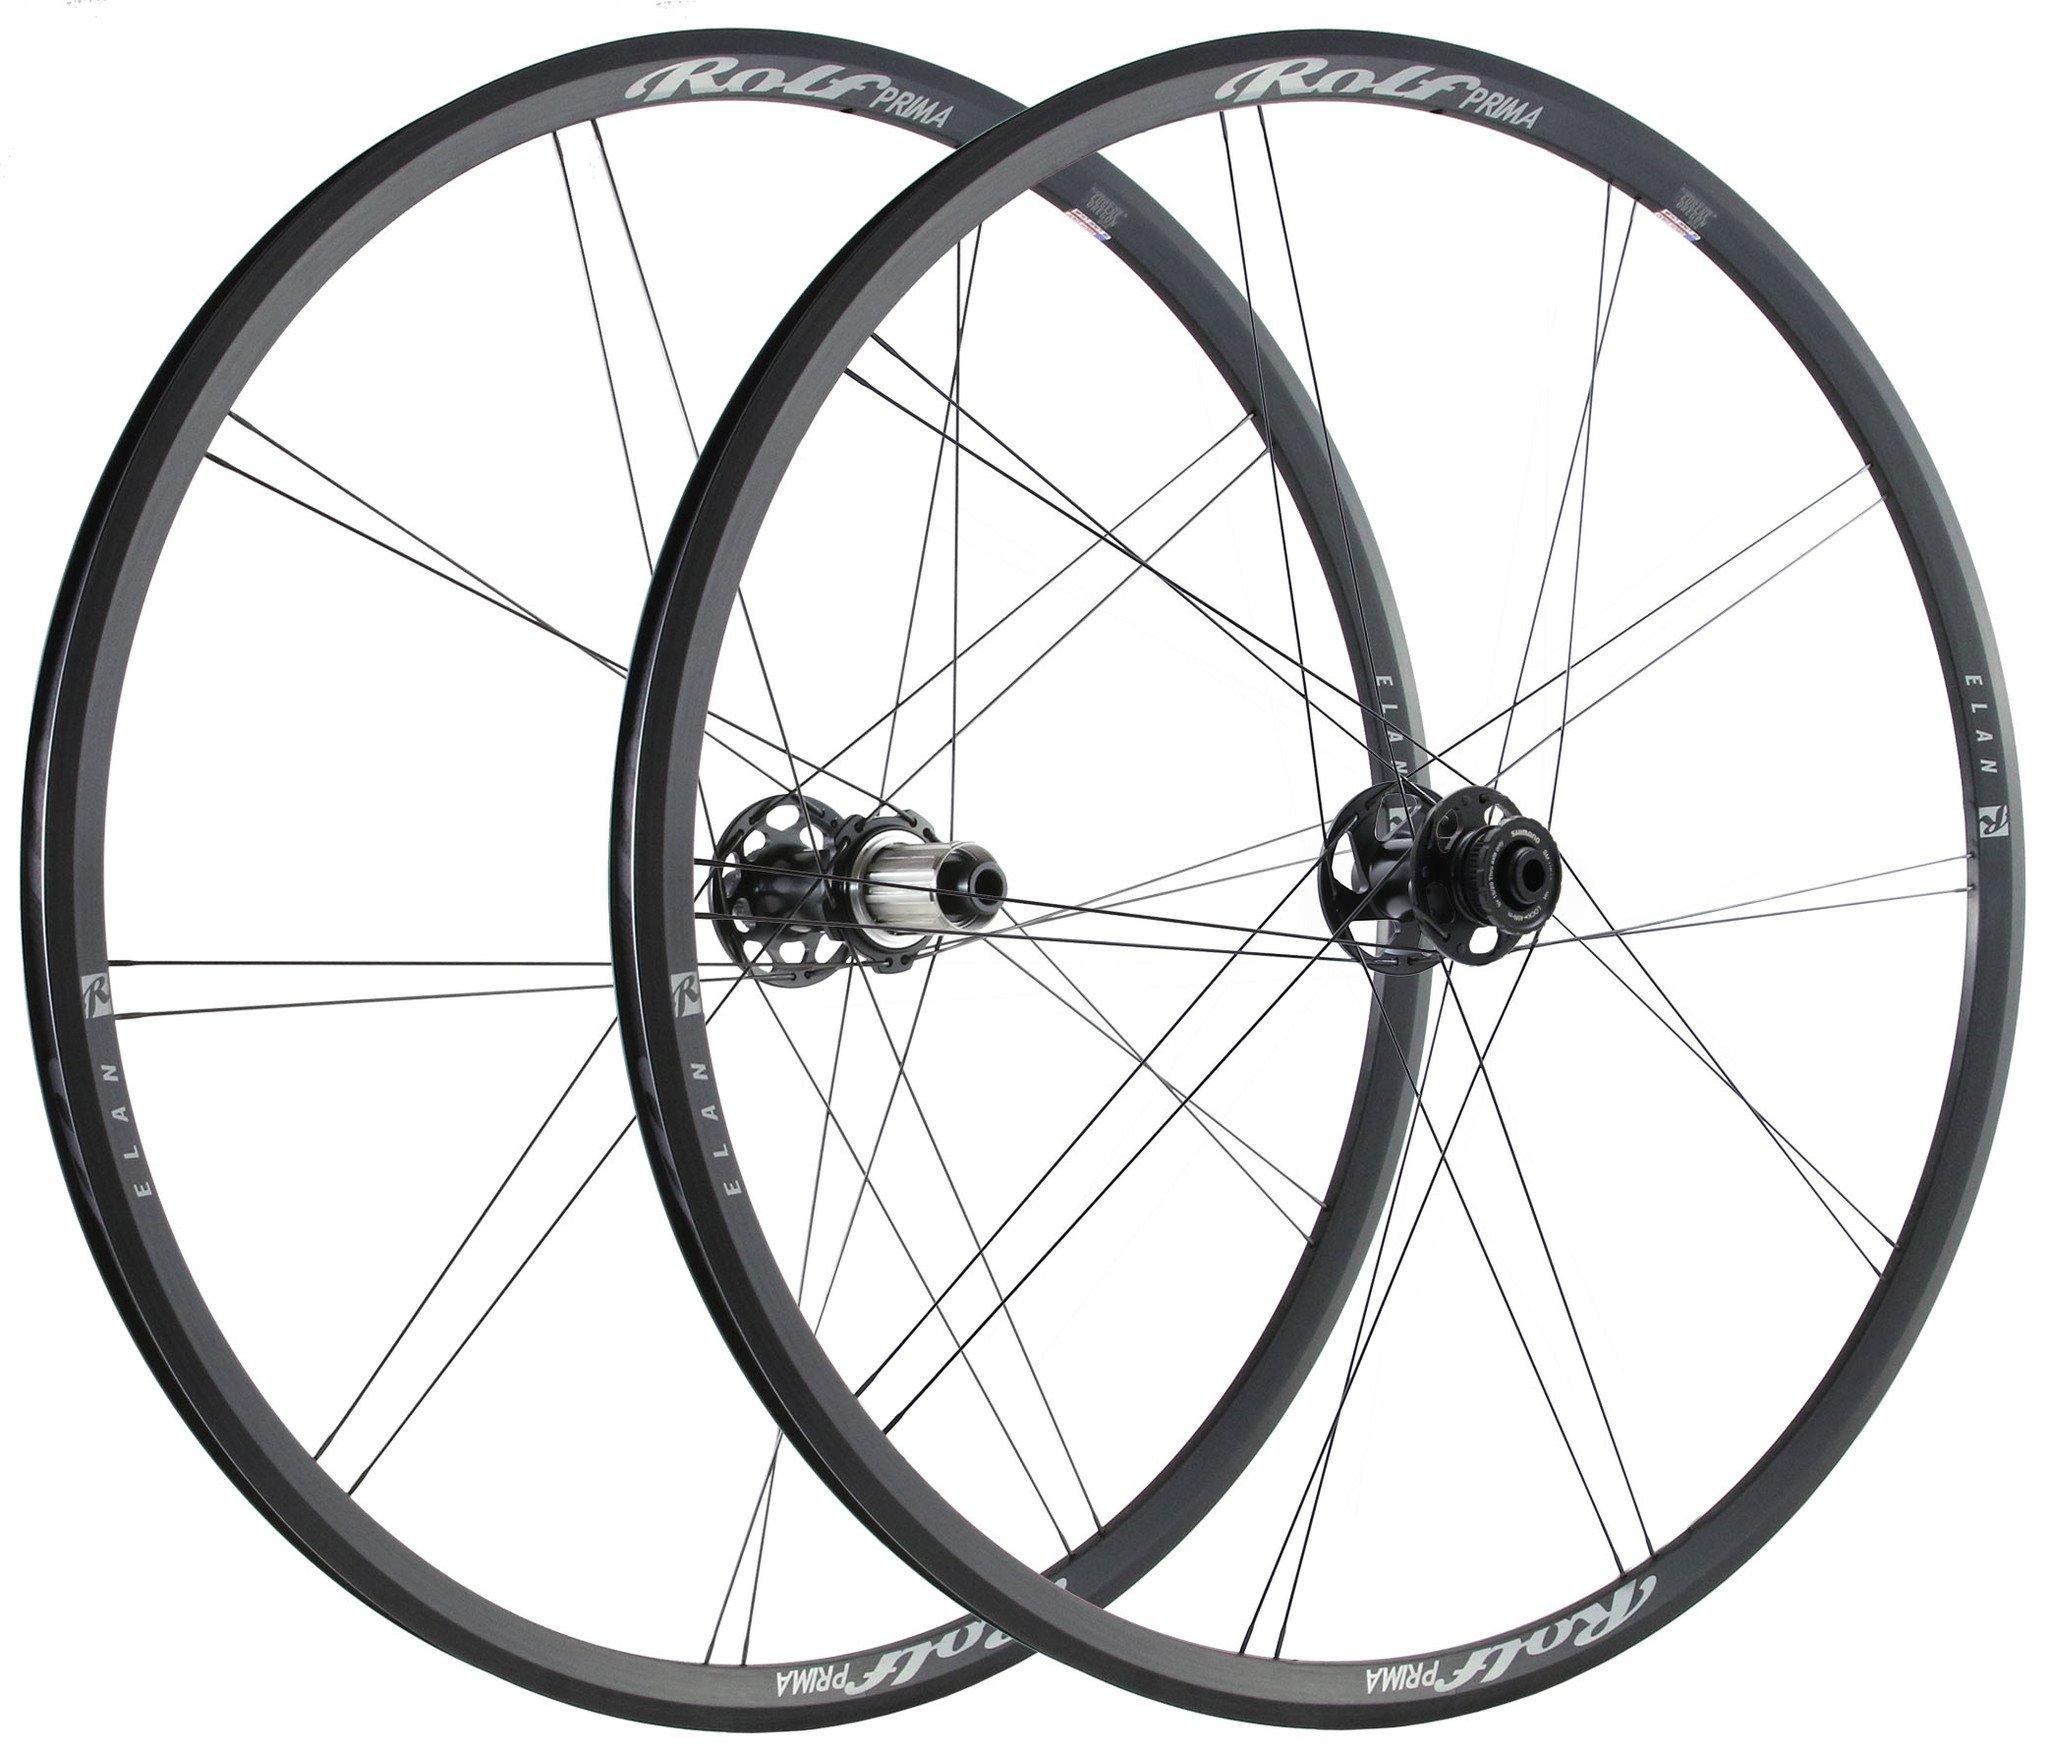 Rolf PRIMA – Elan disc - velmi lehká závodní plášťová zapletená kola. Rolf PRIMA – Elan disc - velmi lehká závodní plášťová zapletená kola.